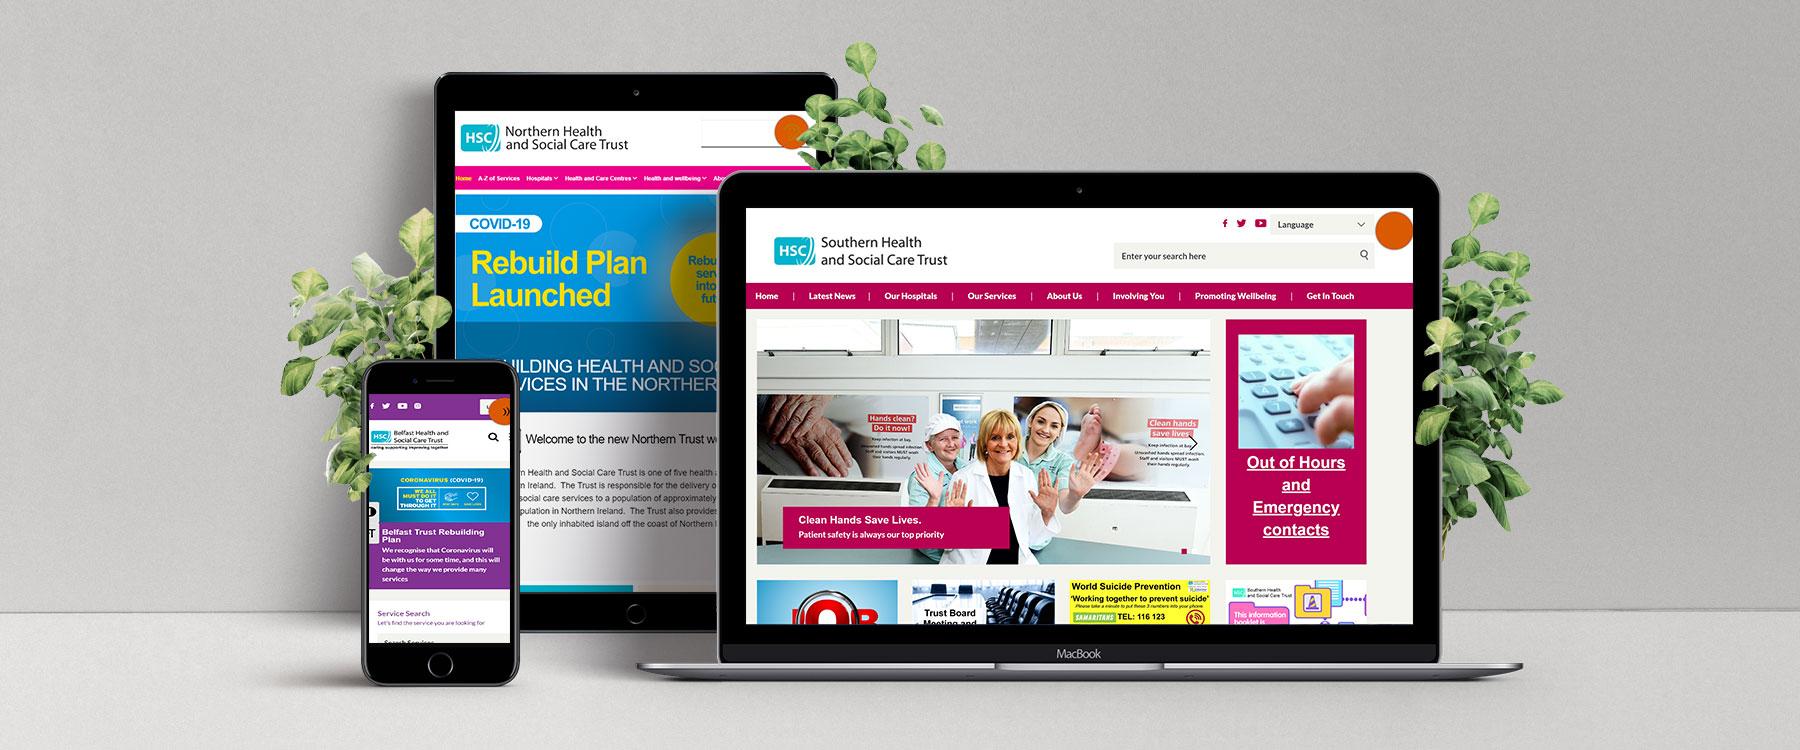 Health Trusts Northern Ireland: Creating Modern, Informative & Important Websites Image